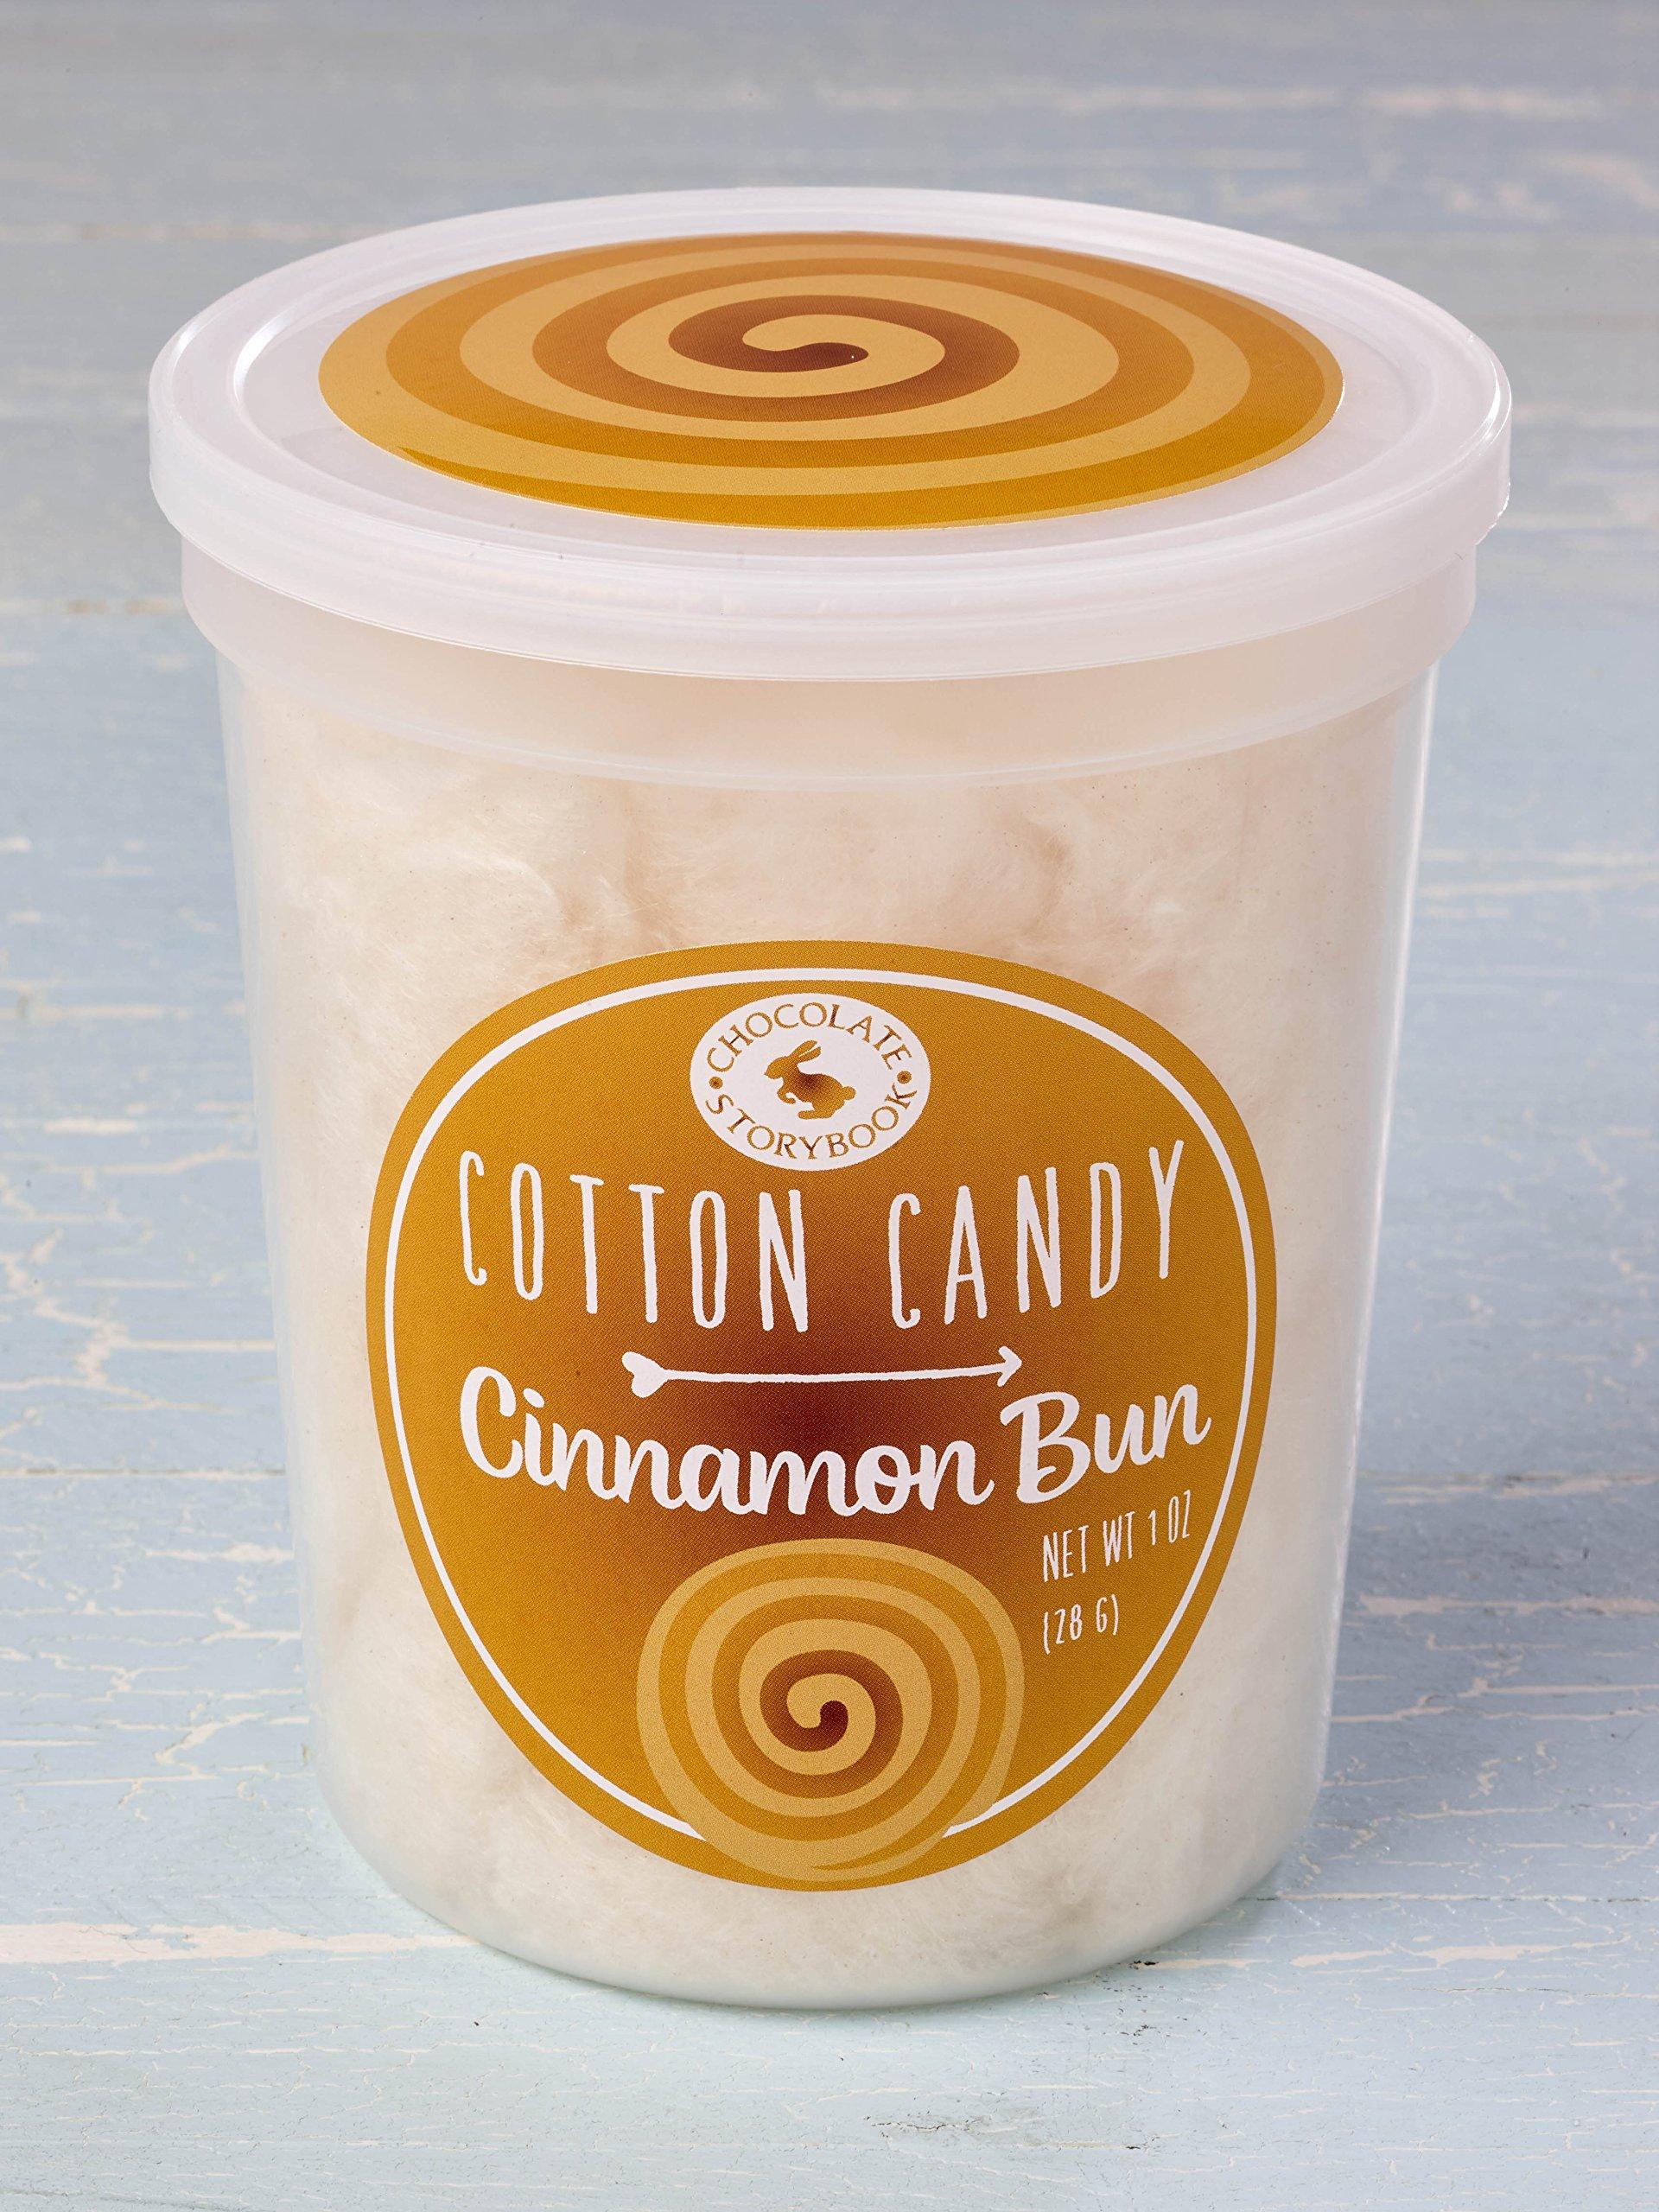 Cinnamon Bun Cotton Candy